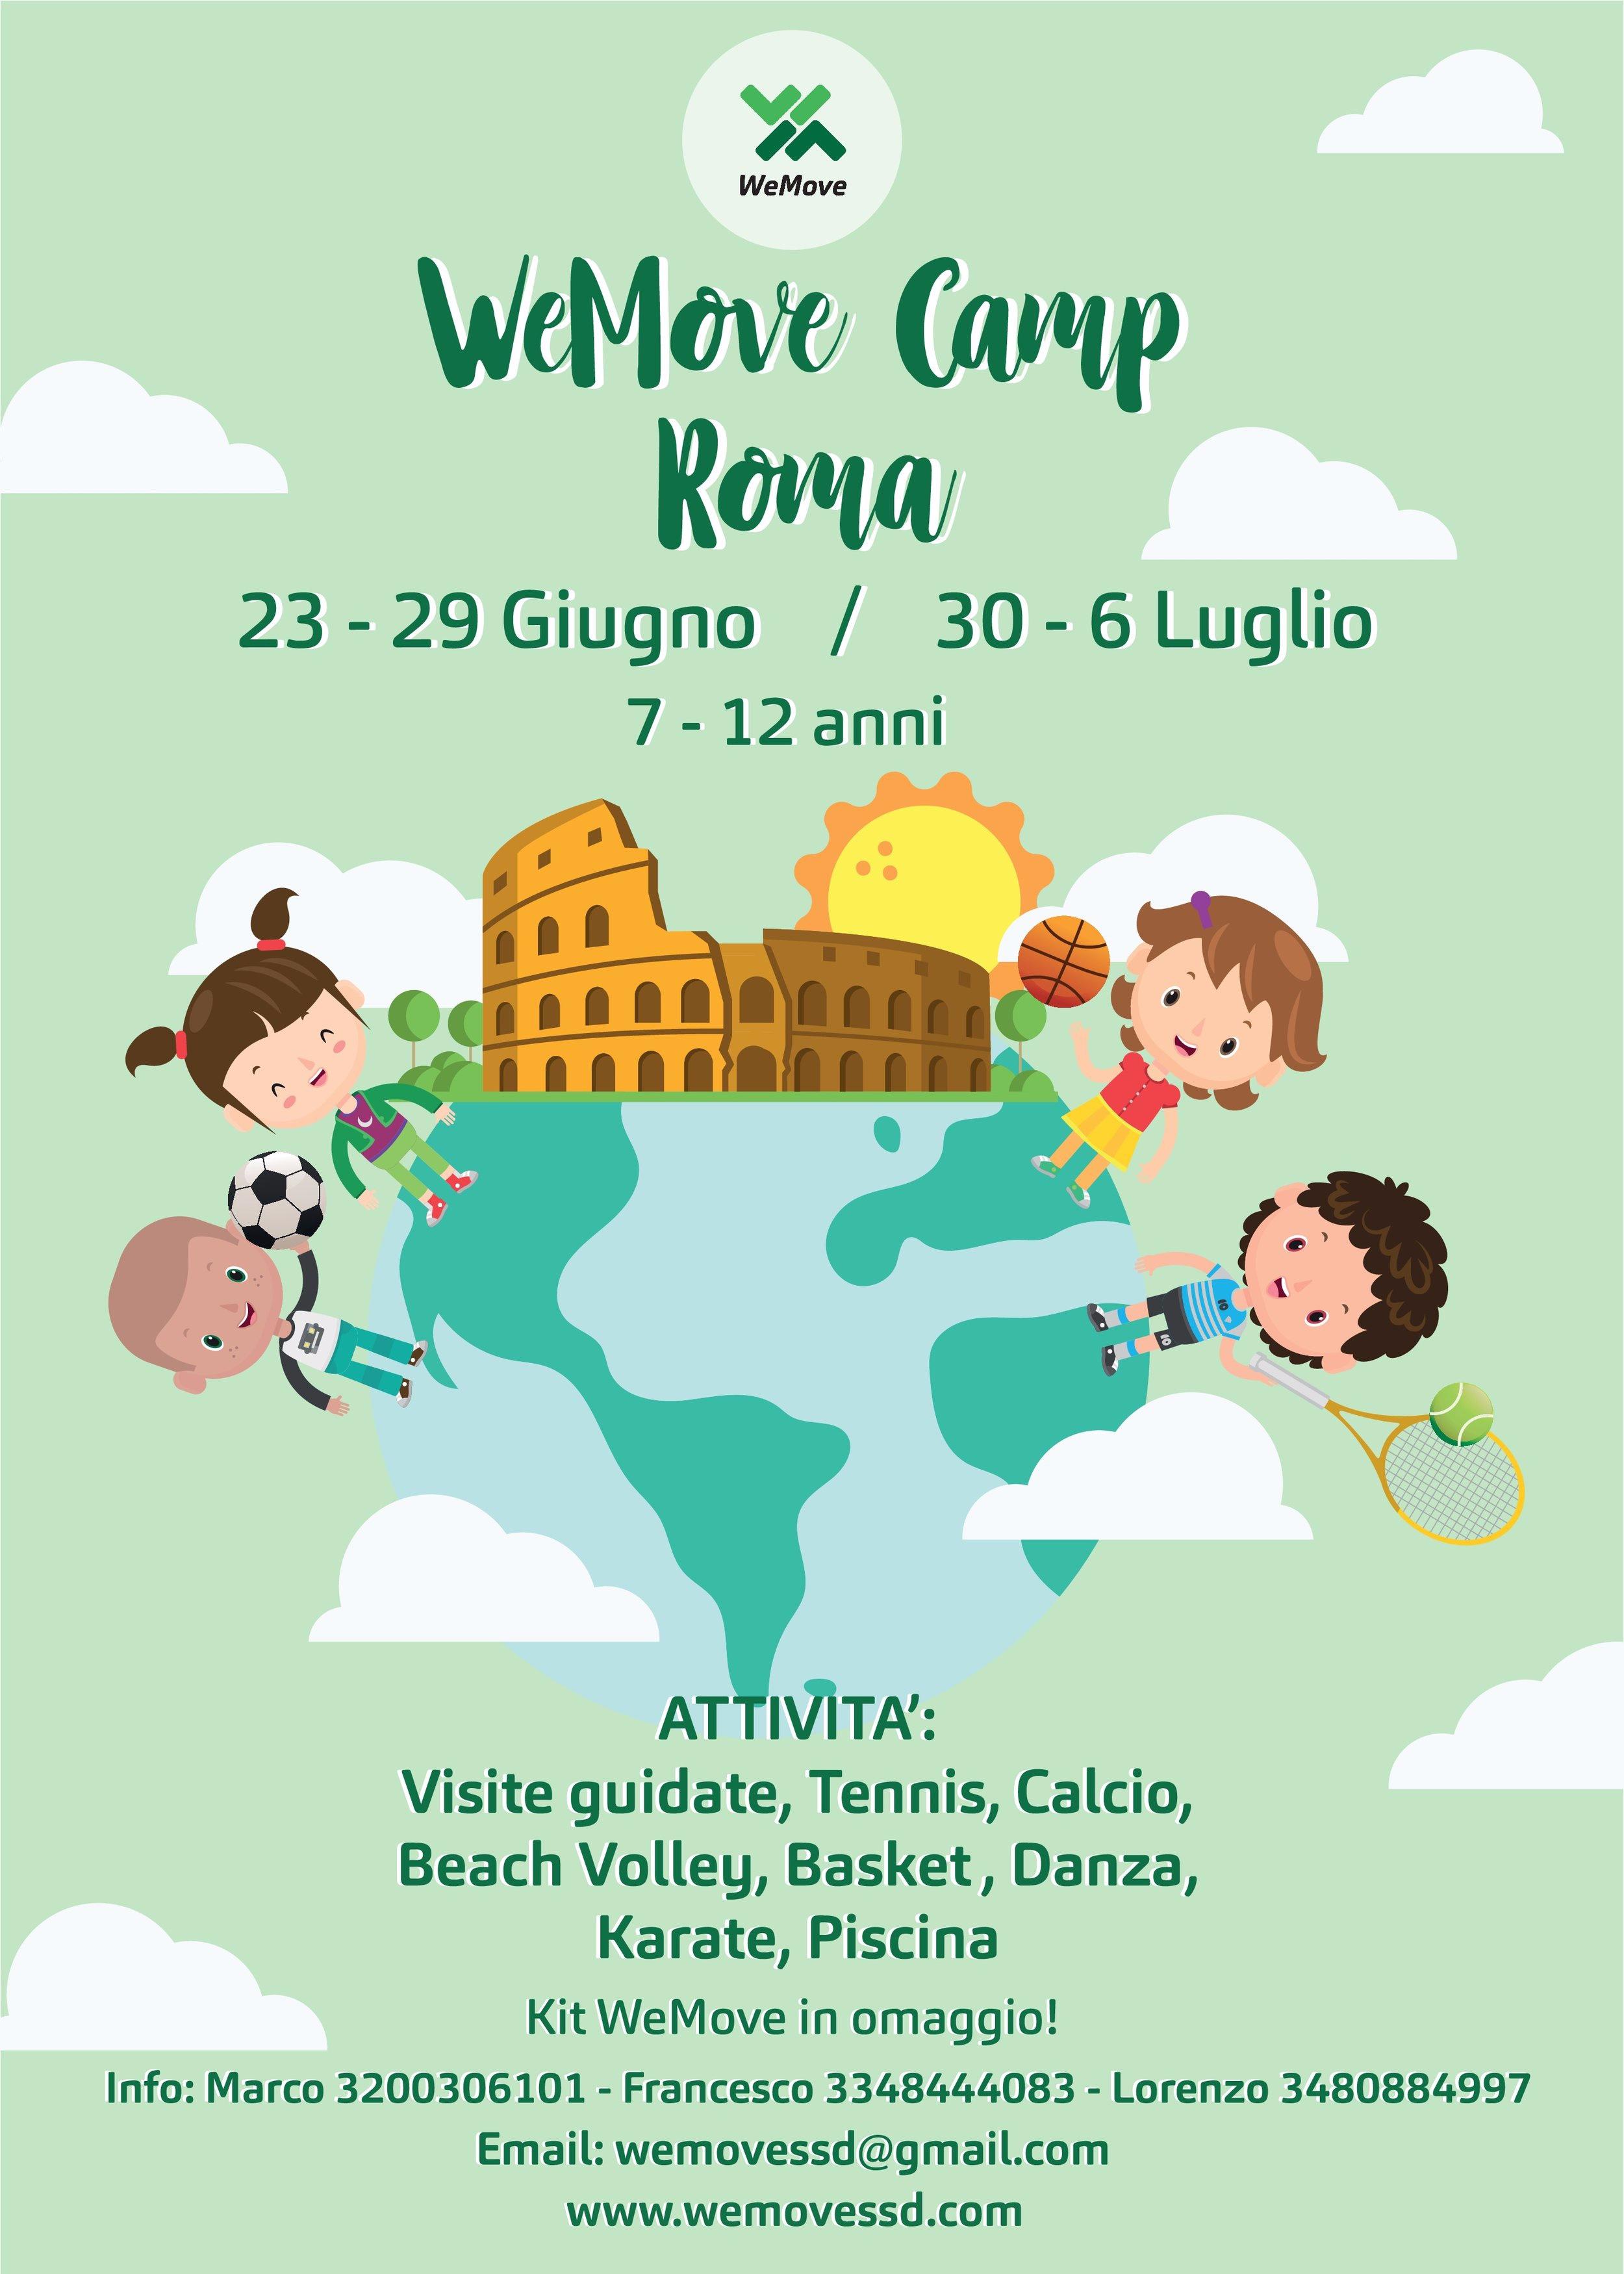 wemove+camp+roma19-001.jpg